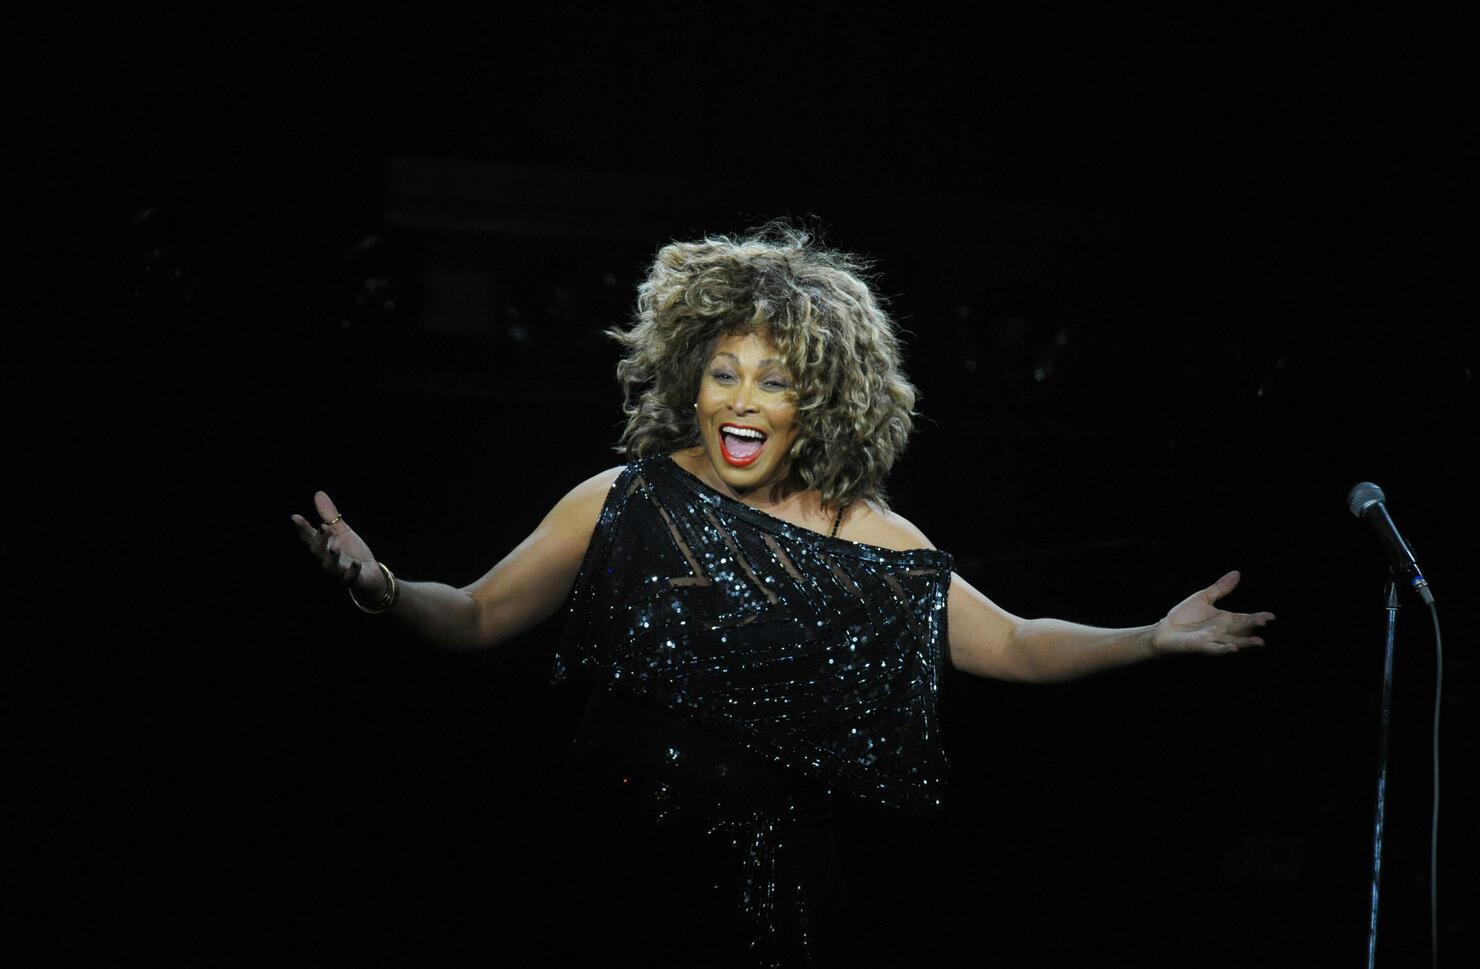 US singer Tina Turner performs on stage